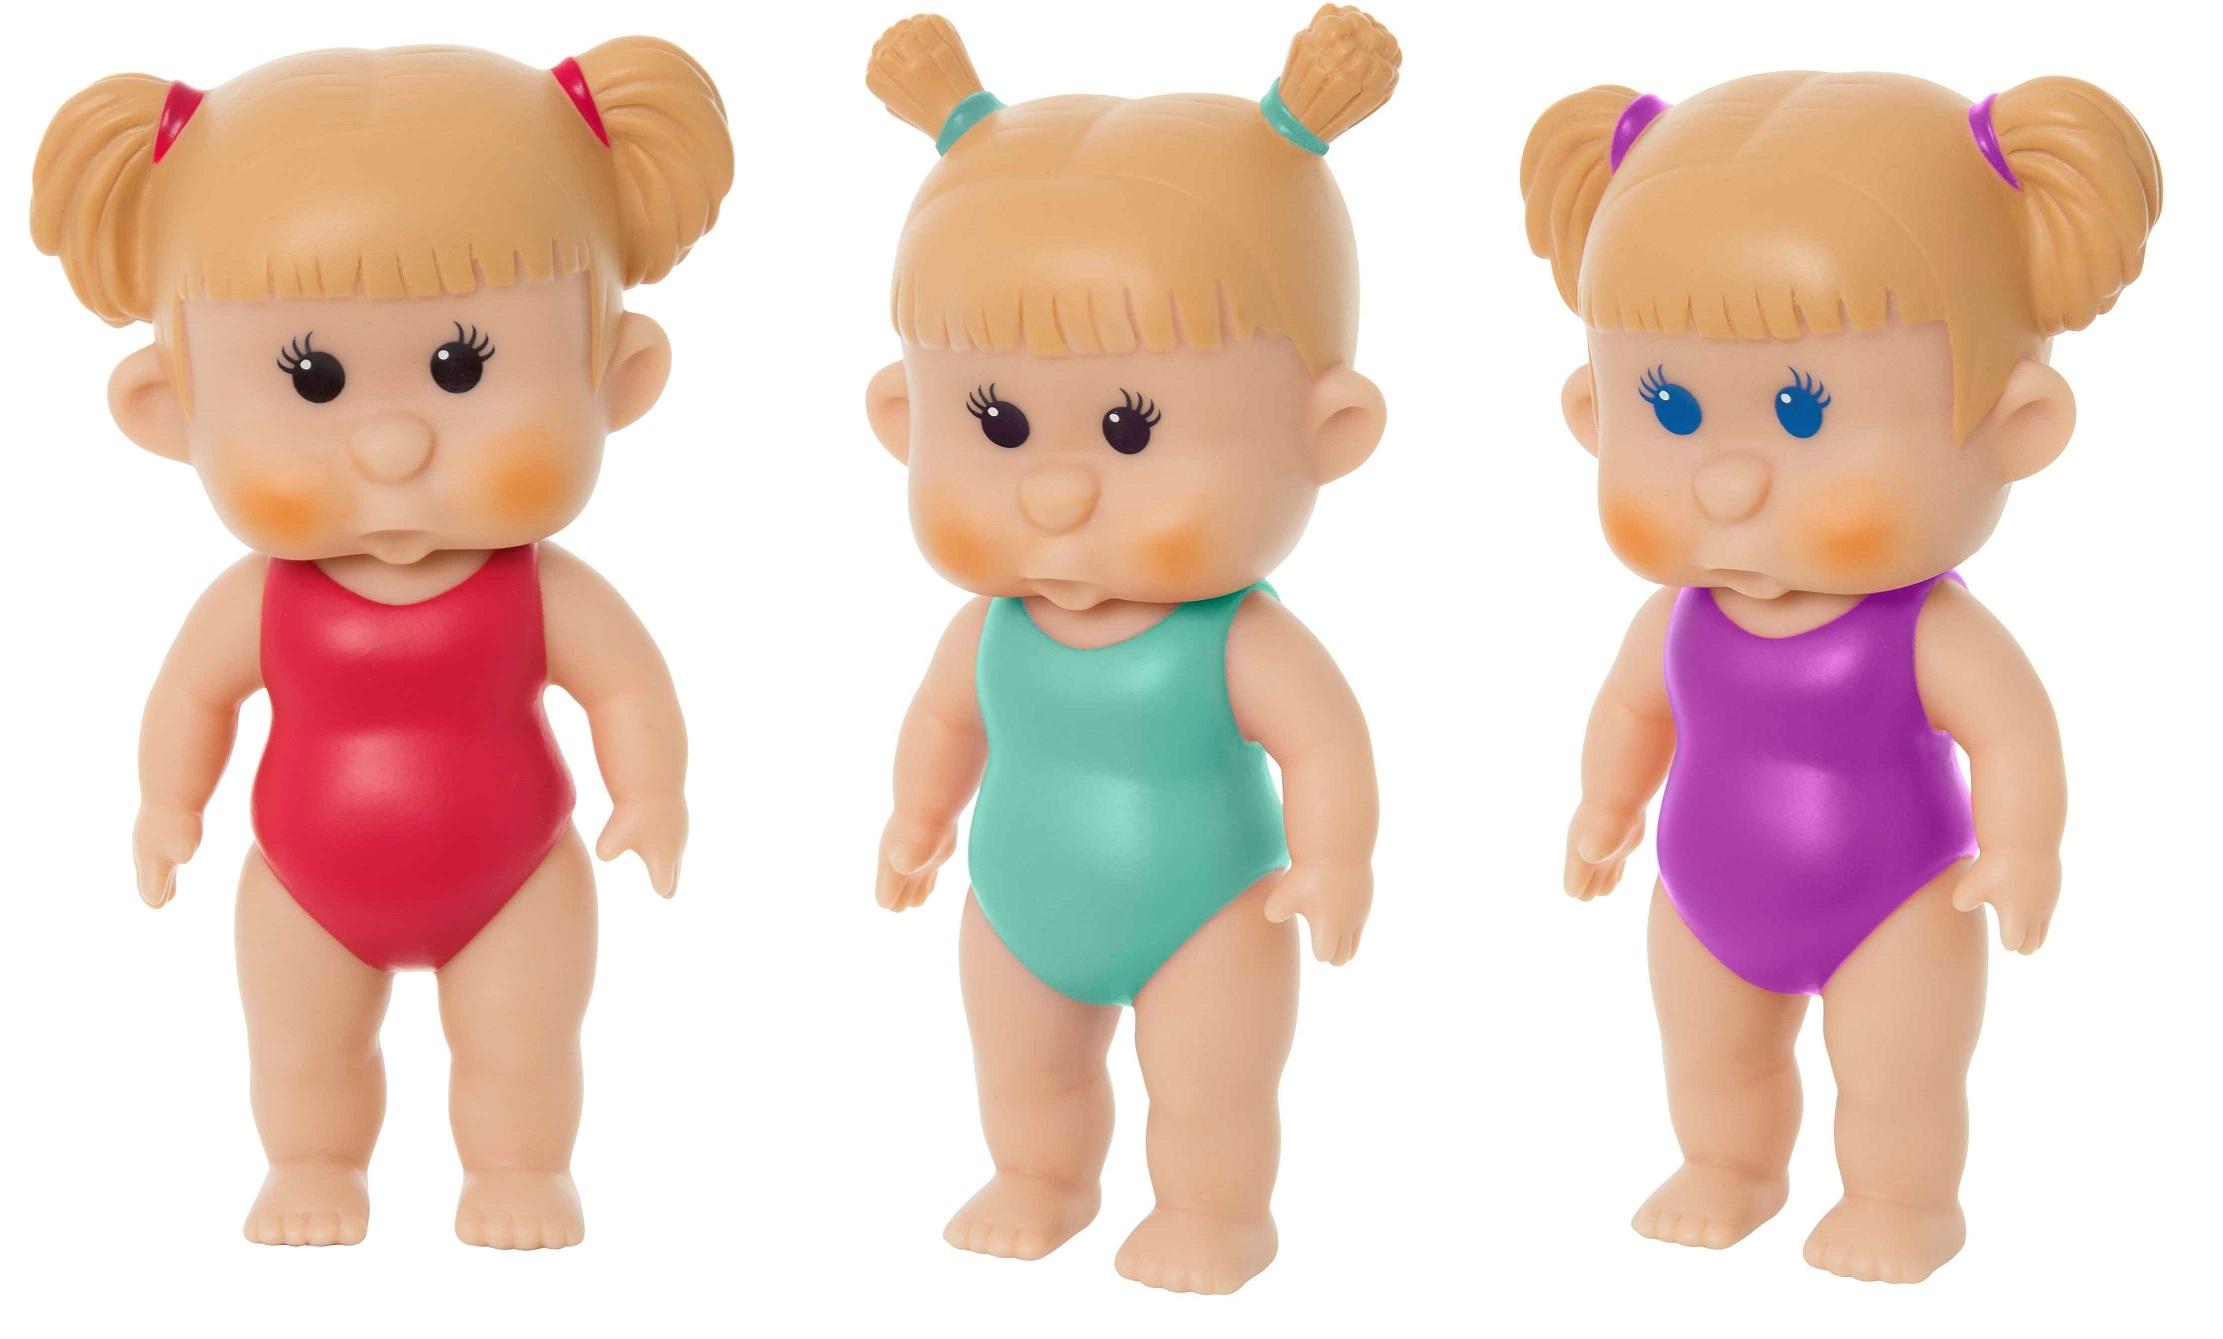 Игрушка для ванны Курносики Куколка Аленка игрушка для ванны курносики куколка аленка